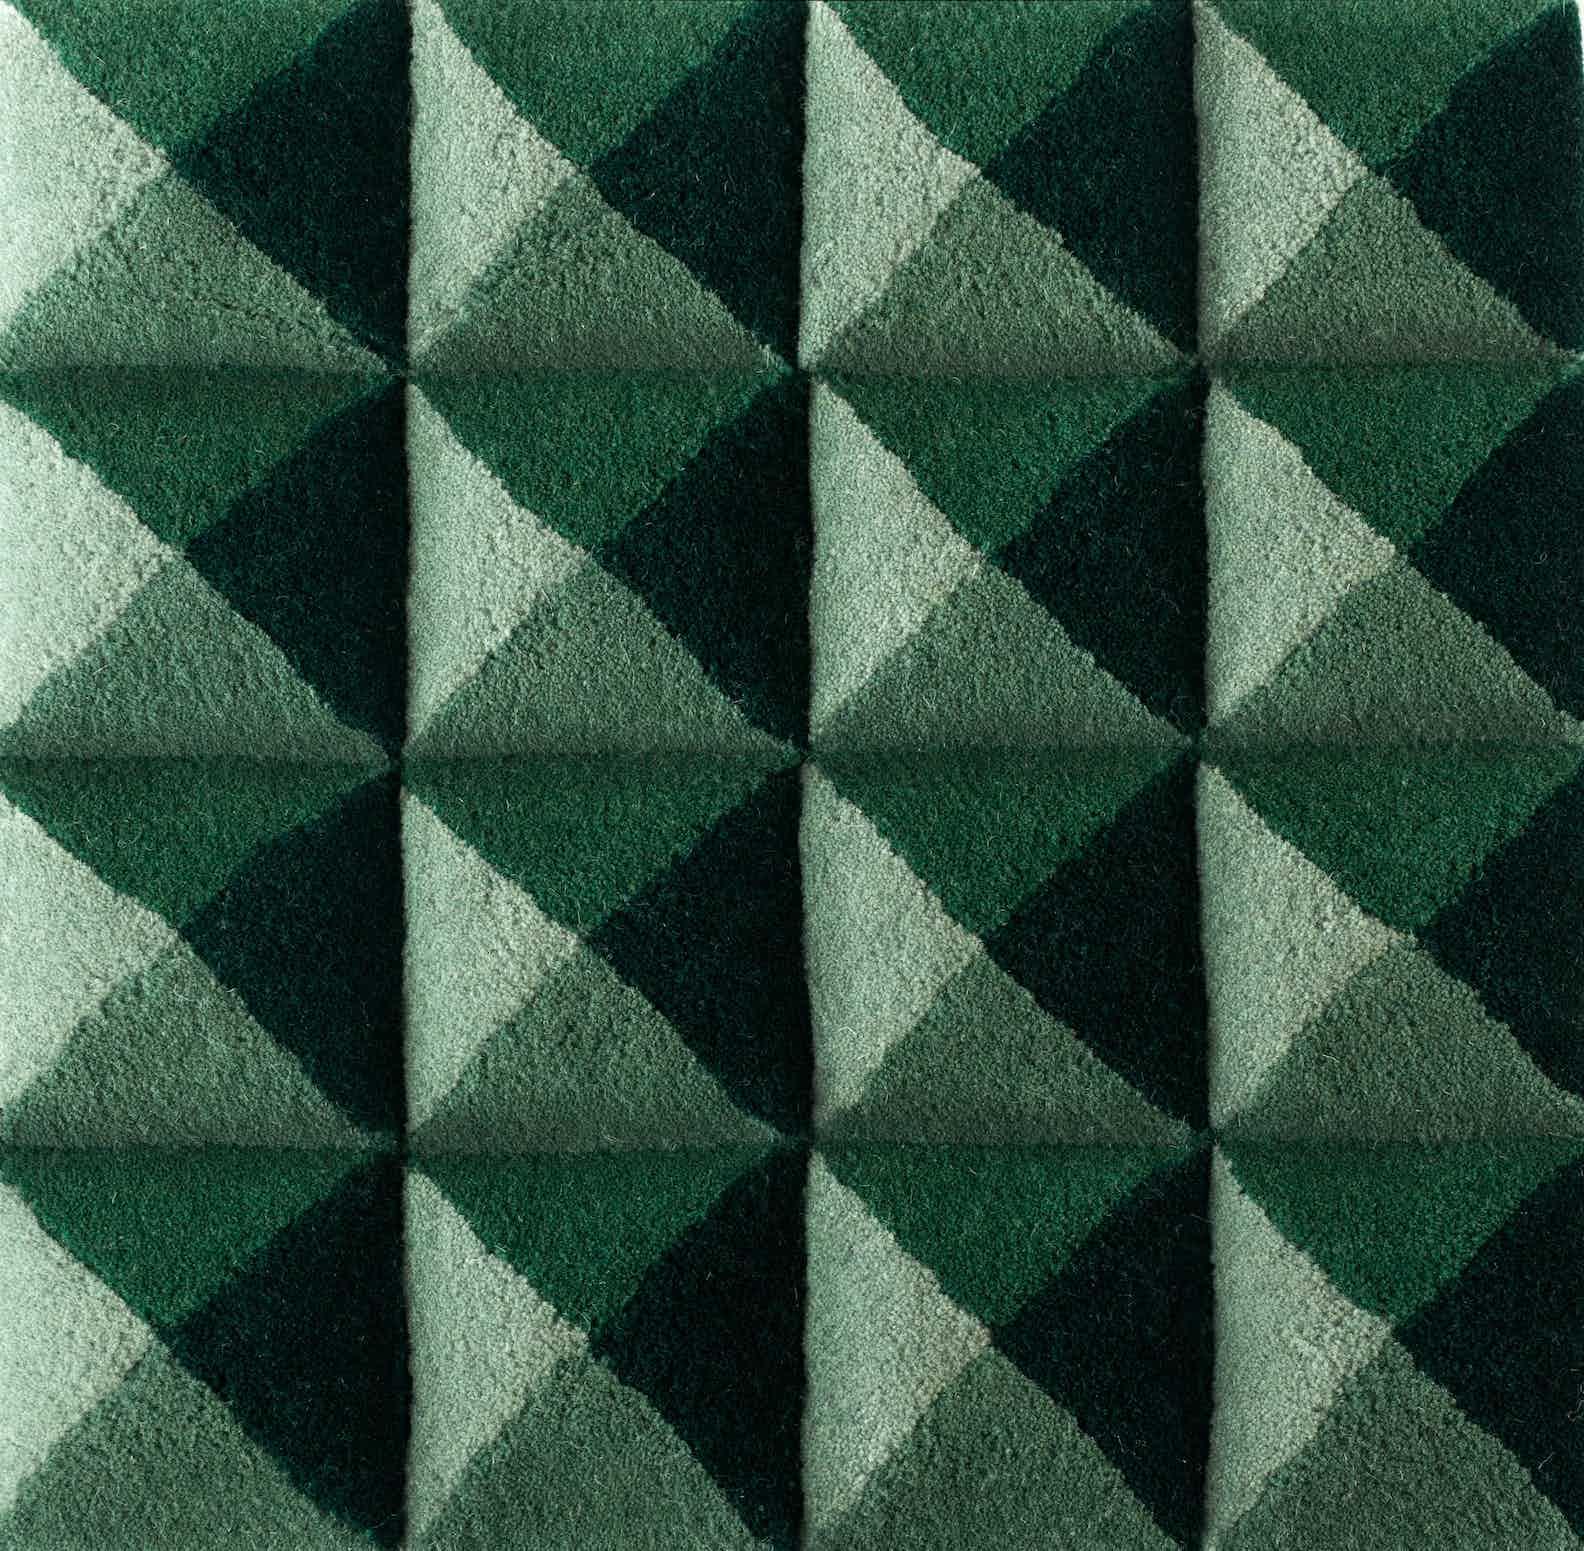 Deadgood-knurled-rug-detail-haute-living